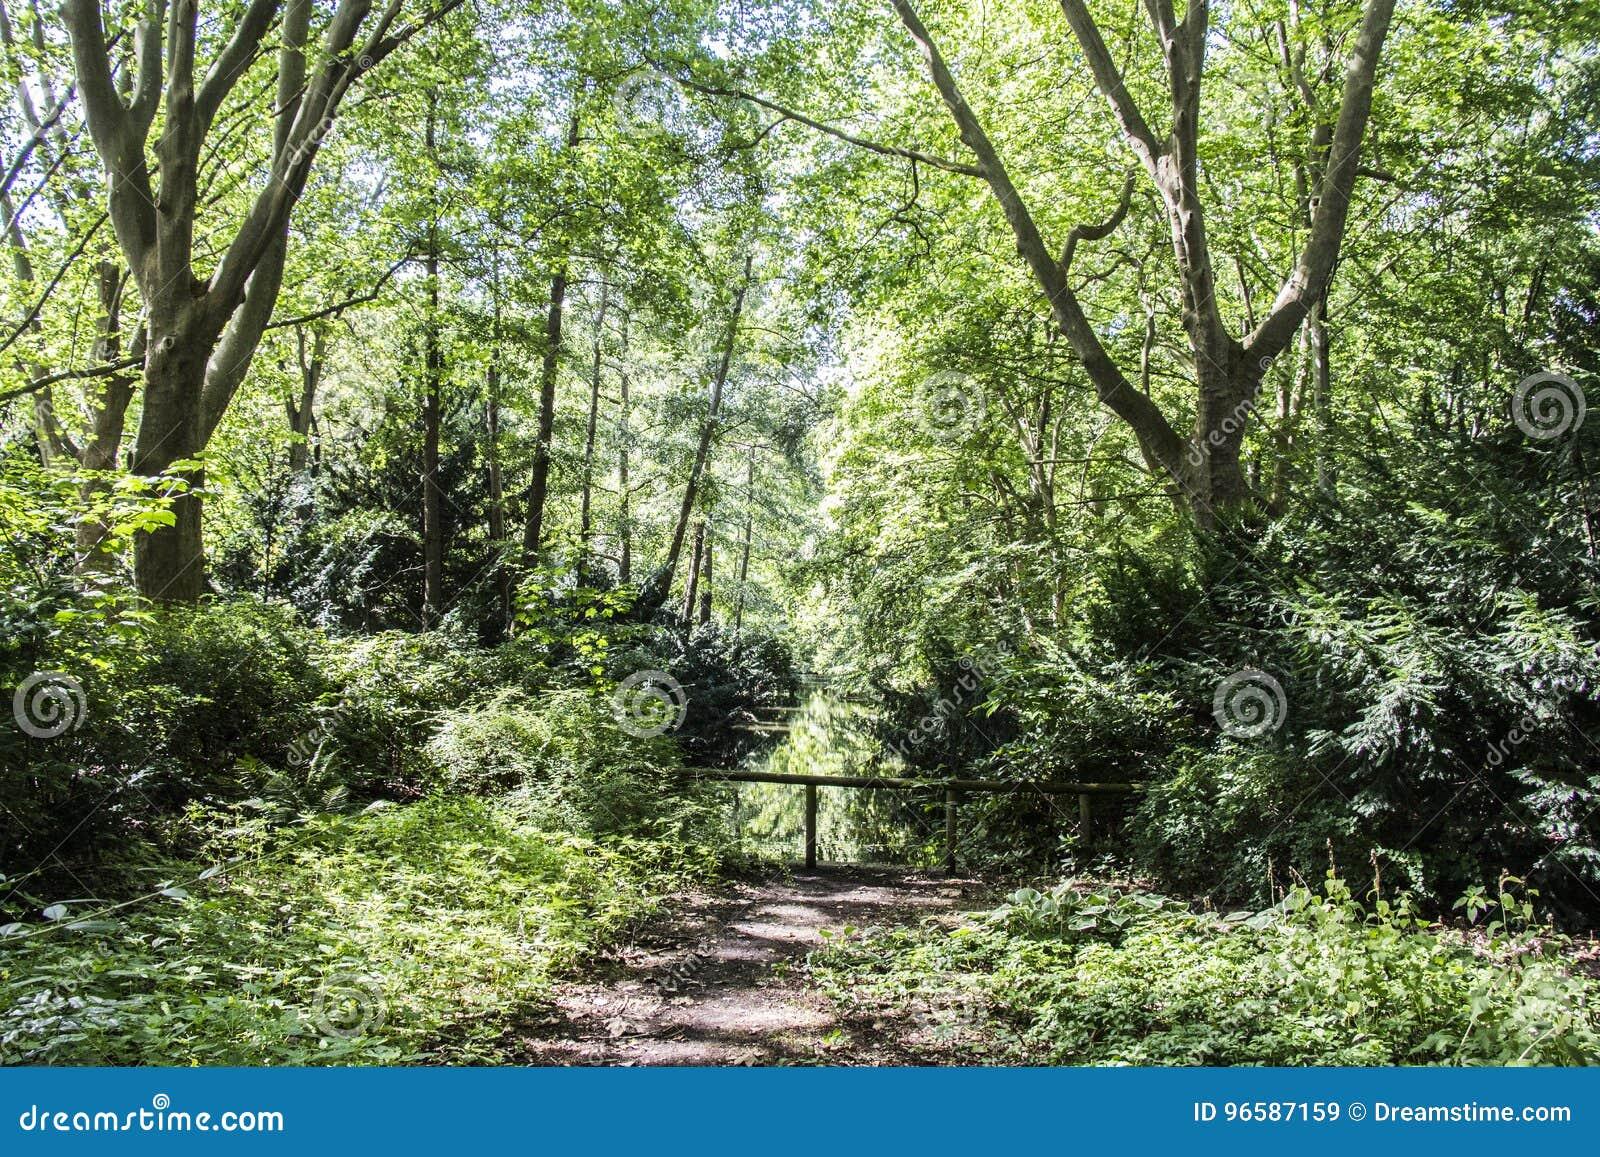 Berlin nature stock image. Image of ...